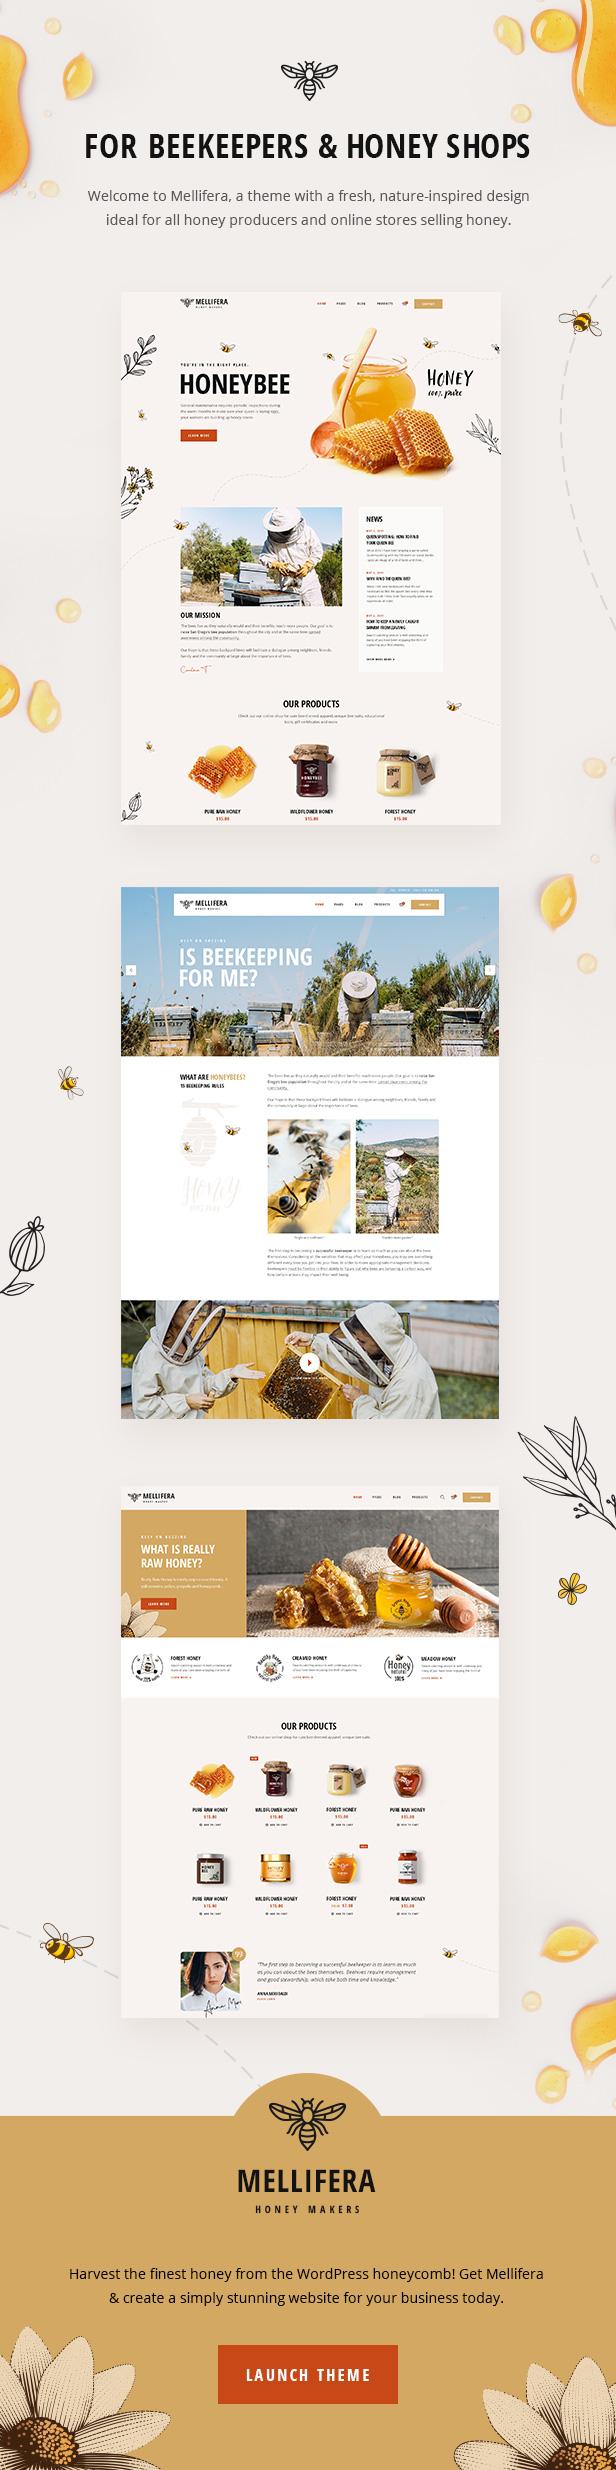 Mellifera - Beekeeping and Honey Shop Theme - 1